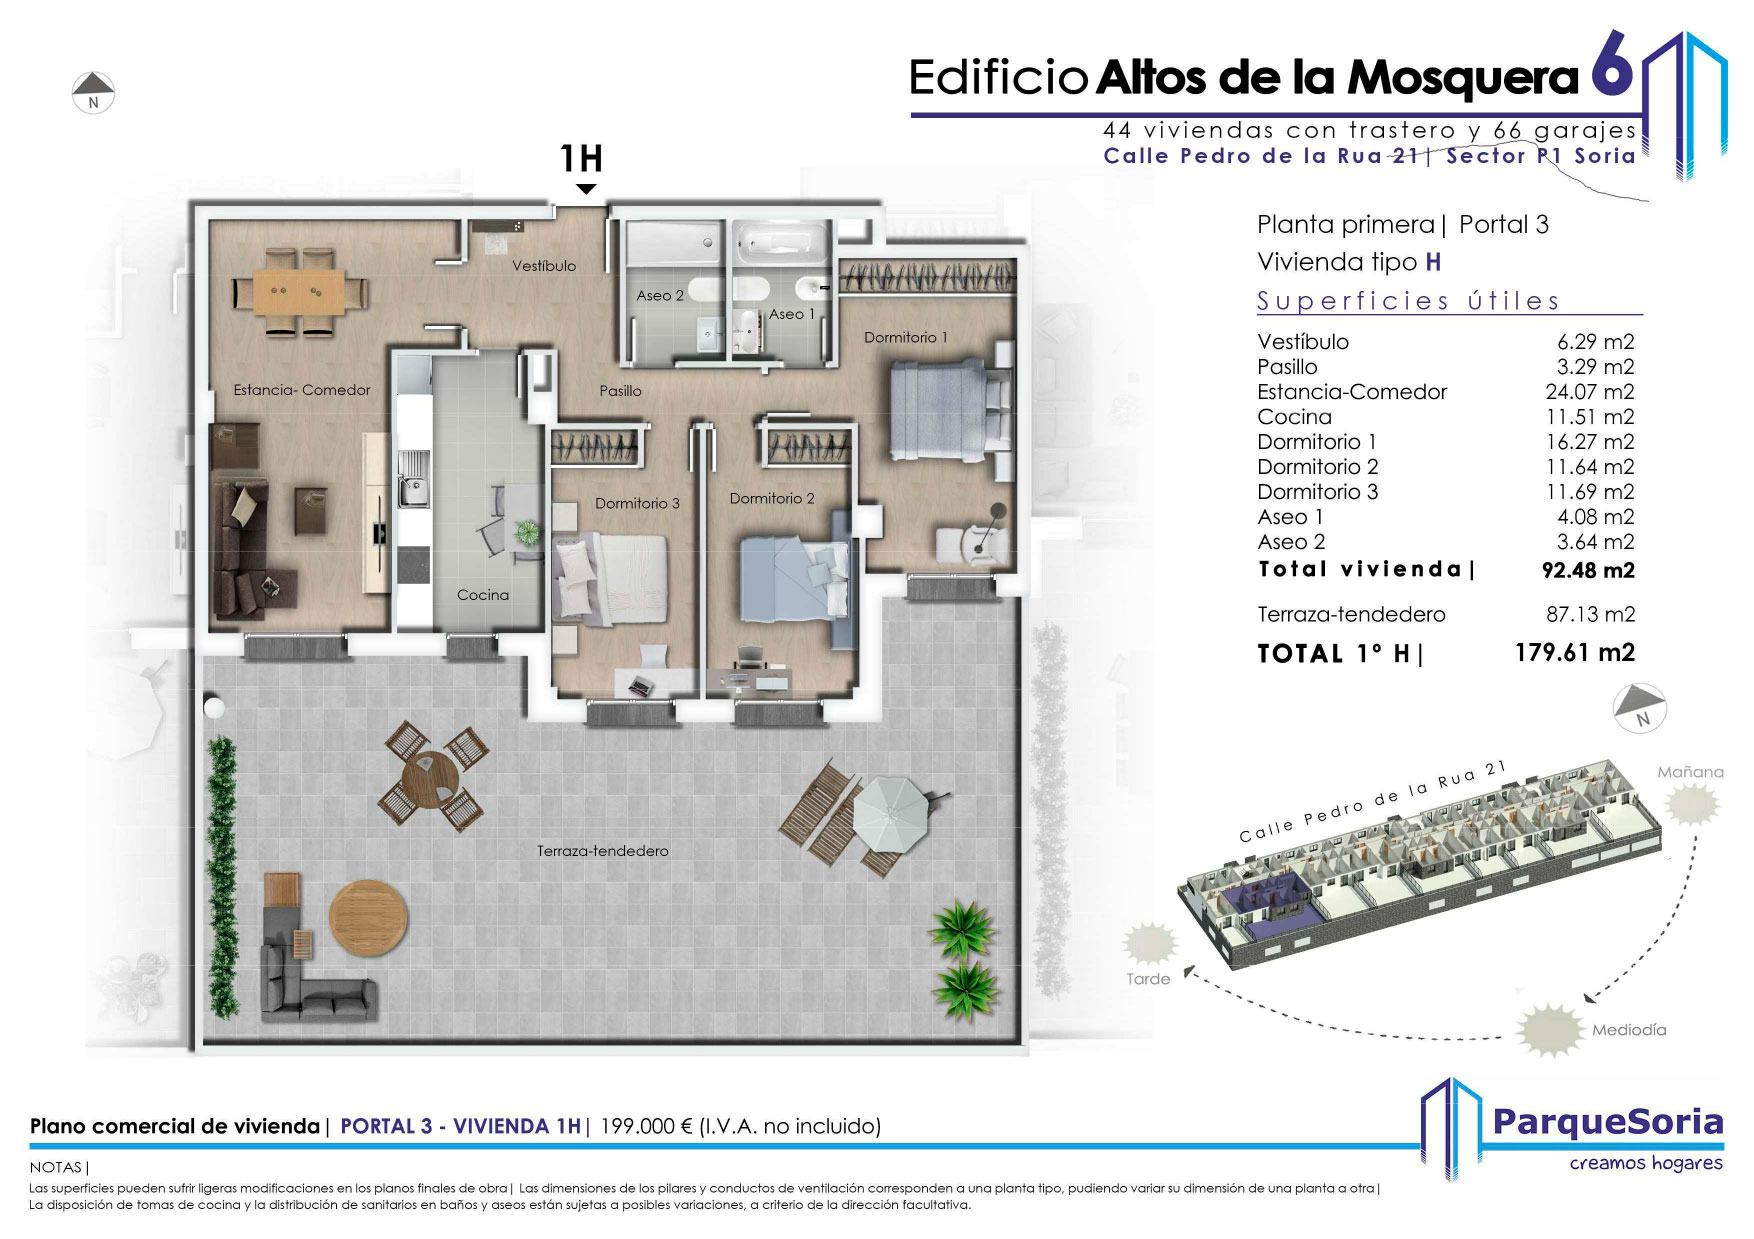 Parquesoria-Altos-de-la-mosquera-6-1H-1